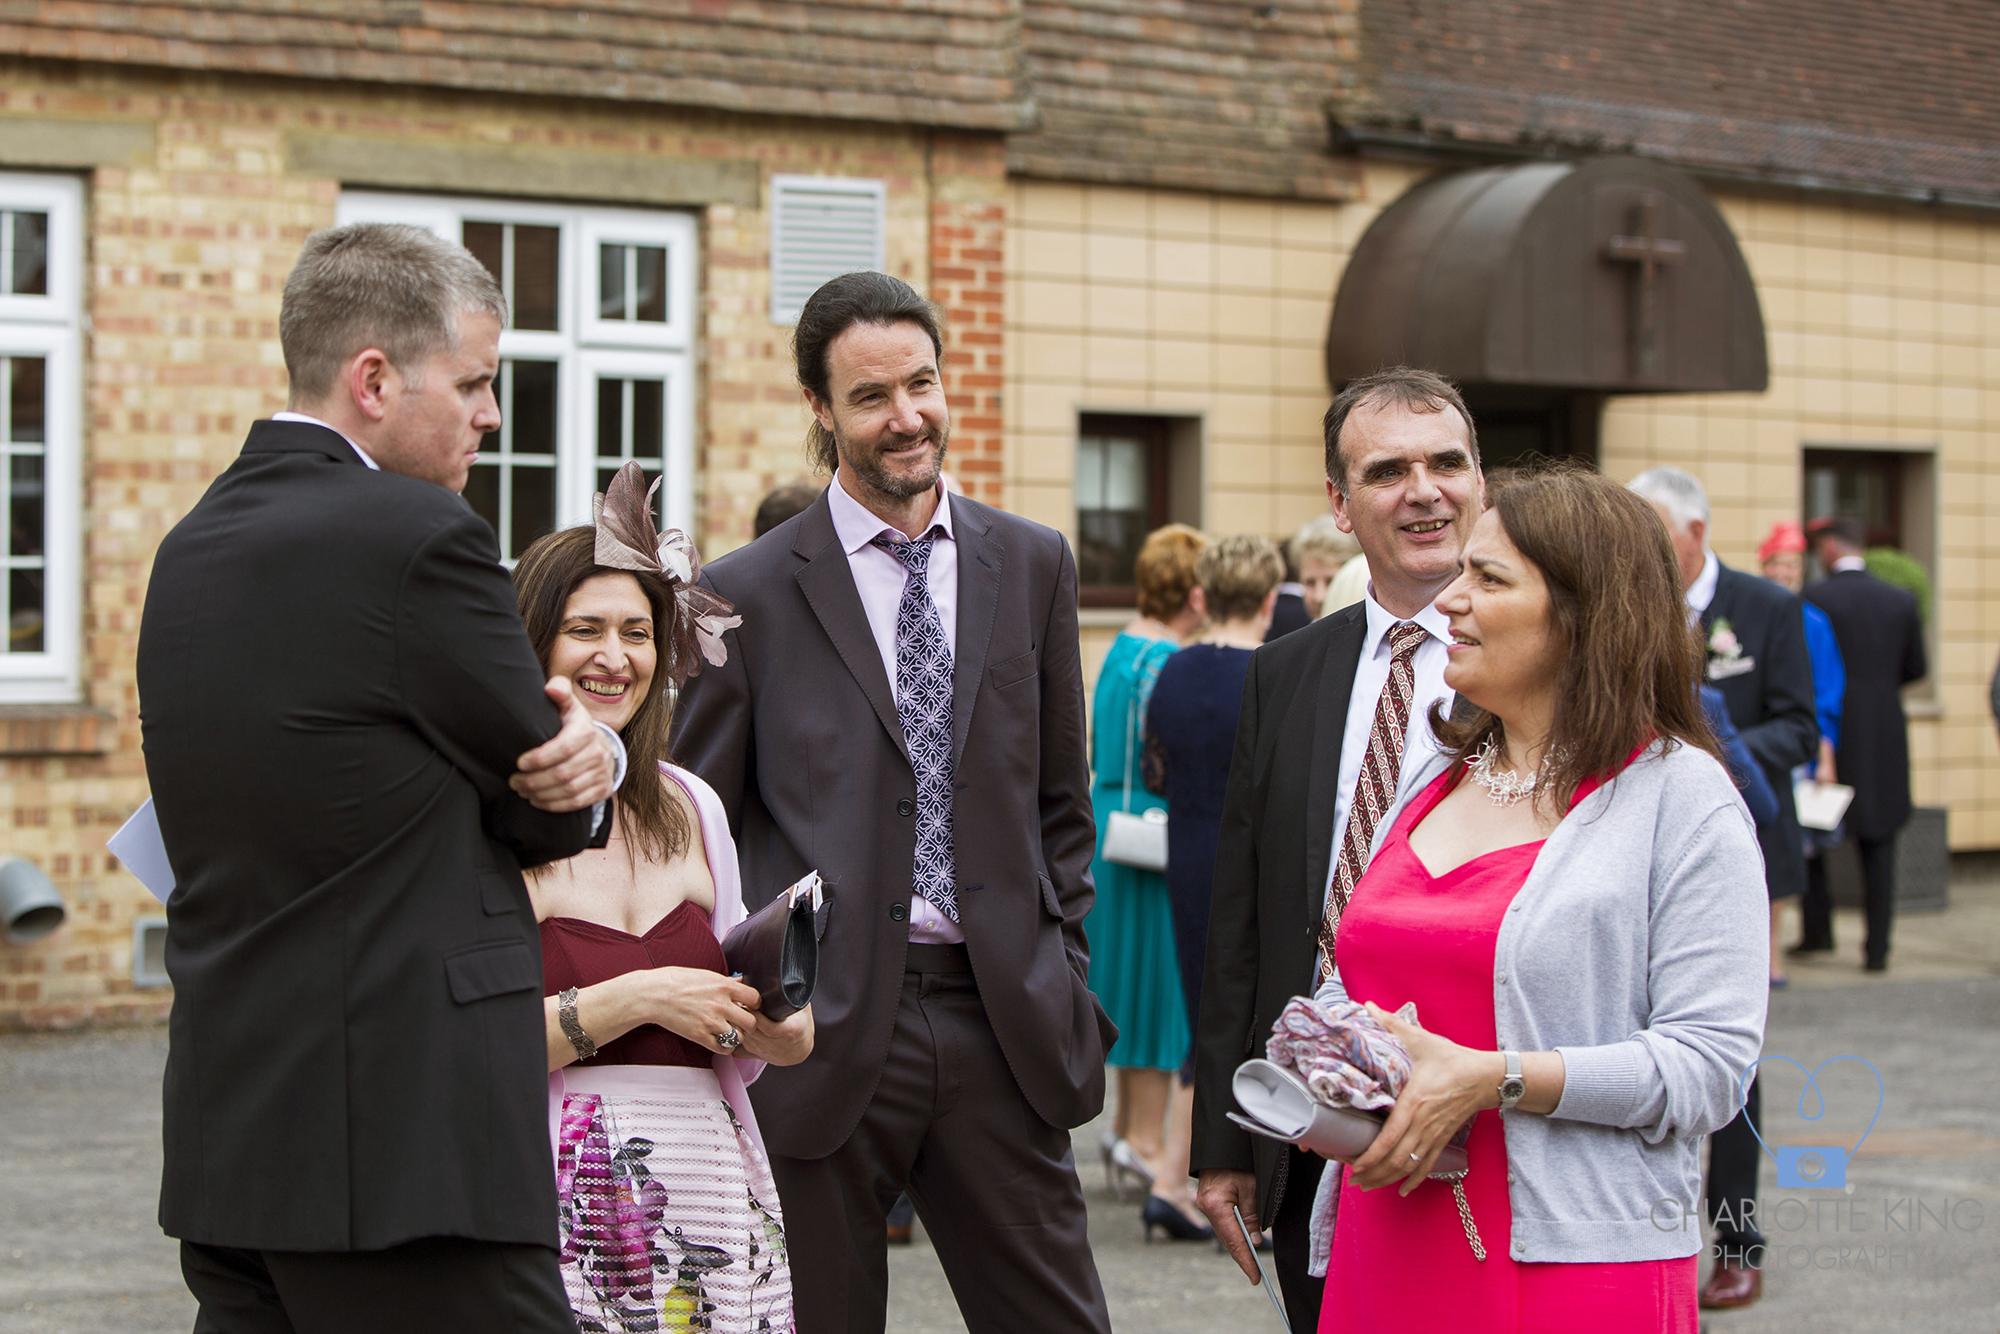 Woldingham-school-wedding-charlotte-king-photography (24)